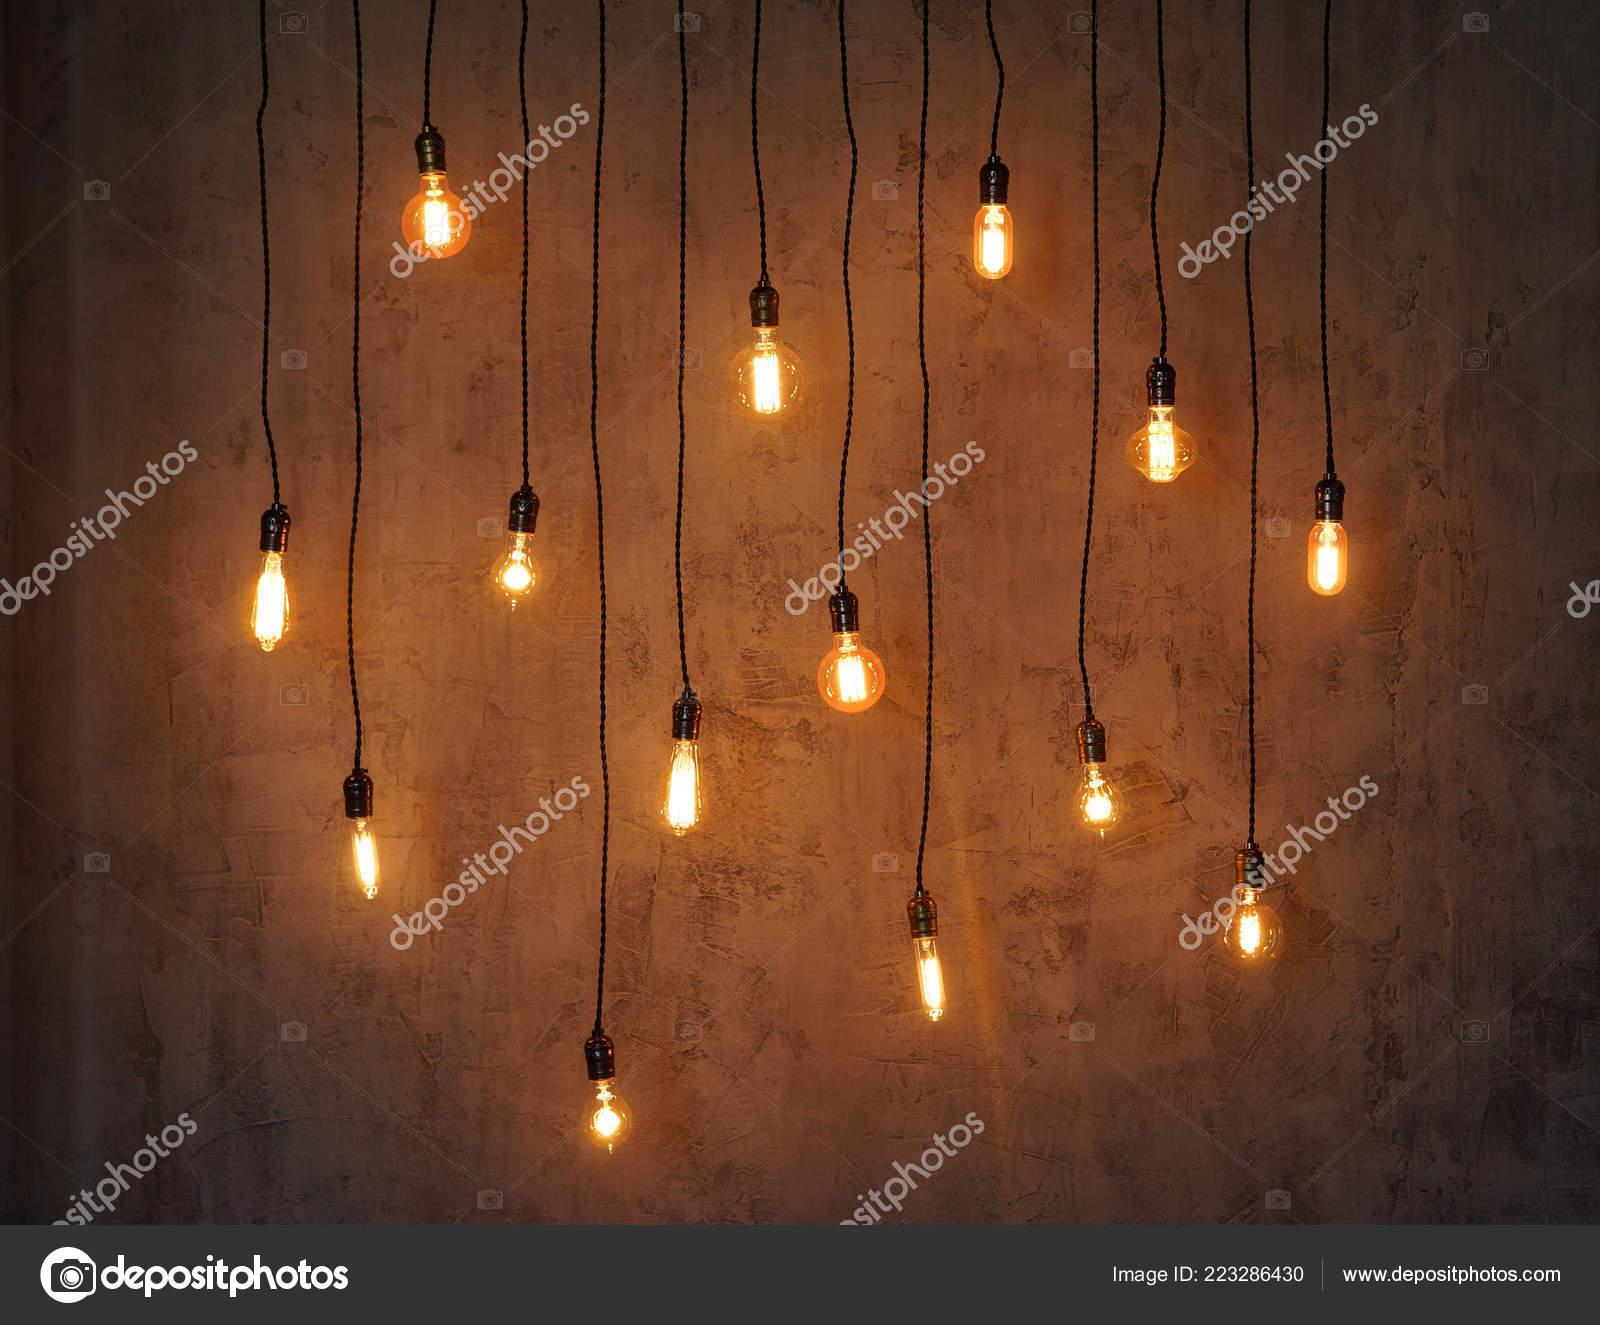 Fondo Bombilla Edison Lámparas Vintage Sobre Fondo Concreto